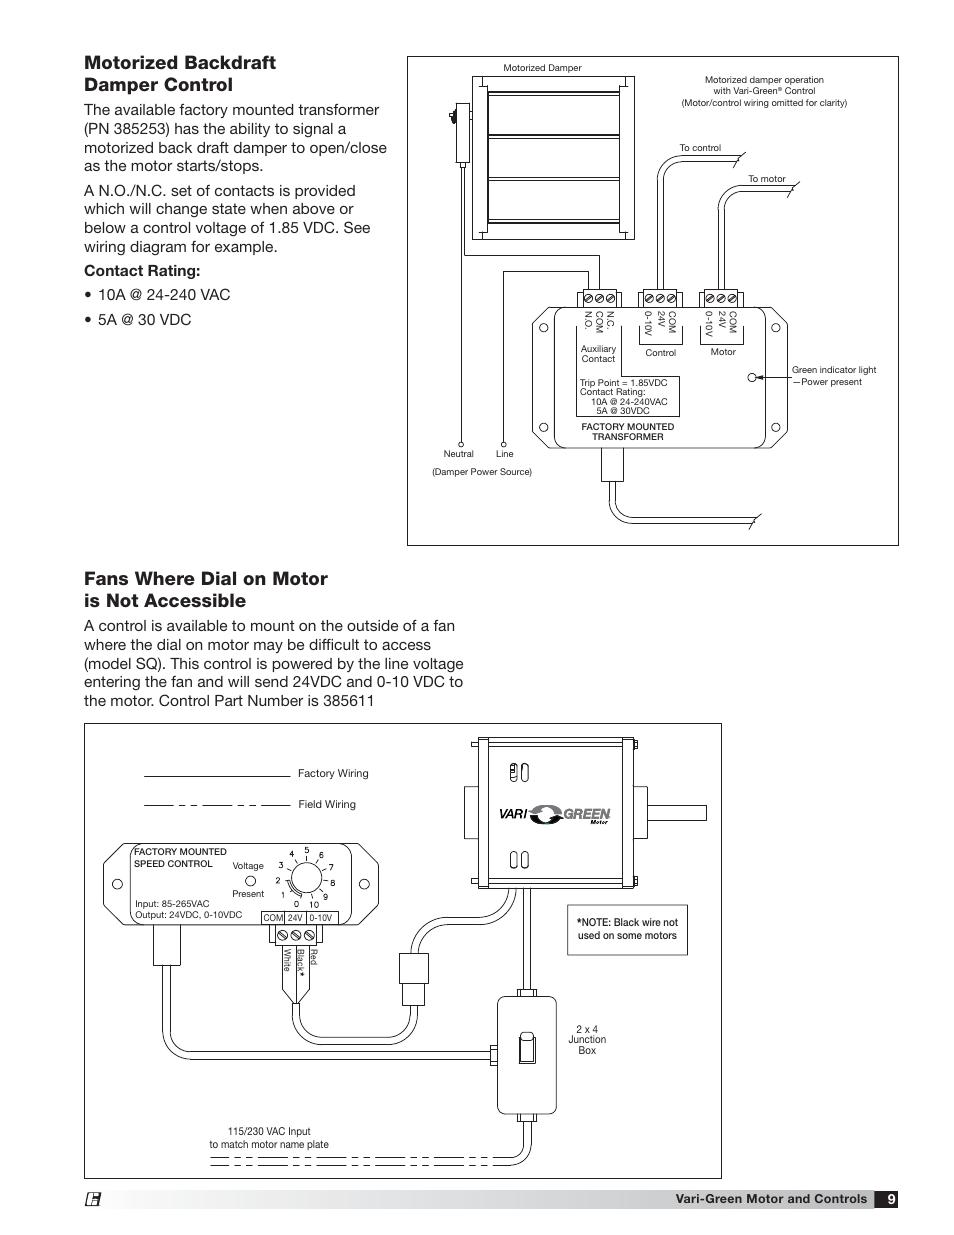 24 Vac Motorized Damper Wiring Diagram